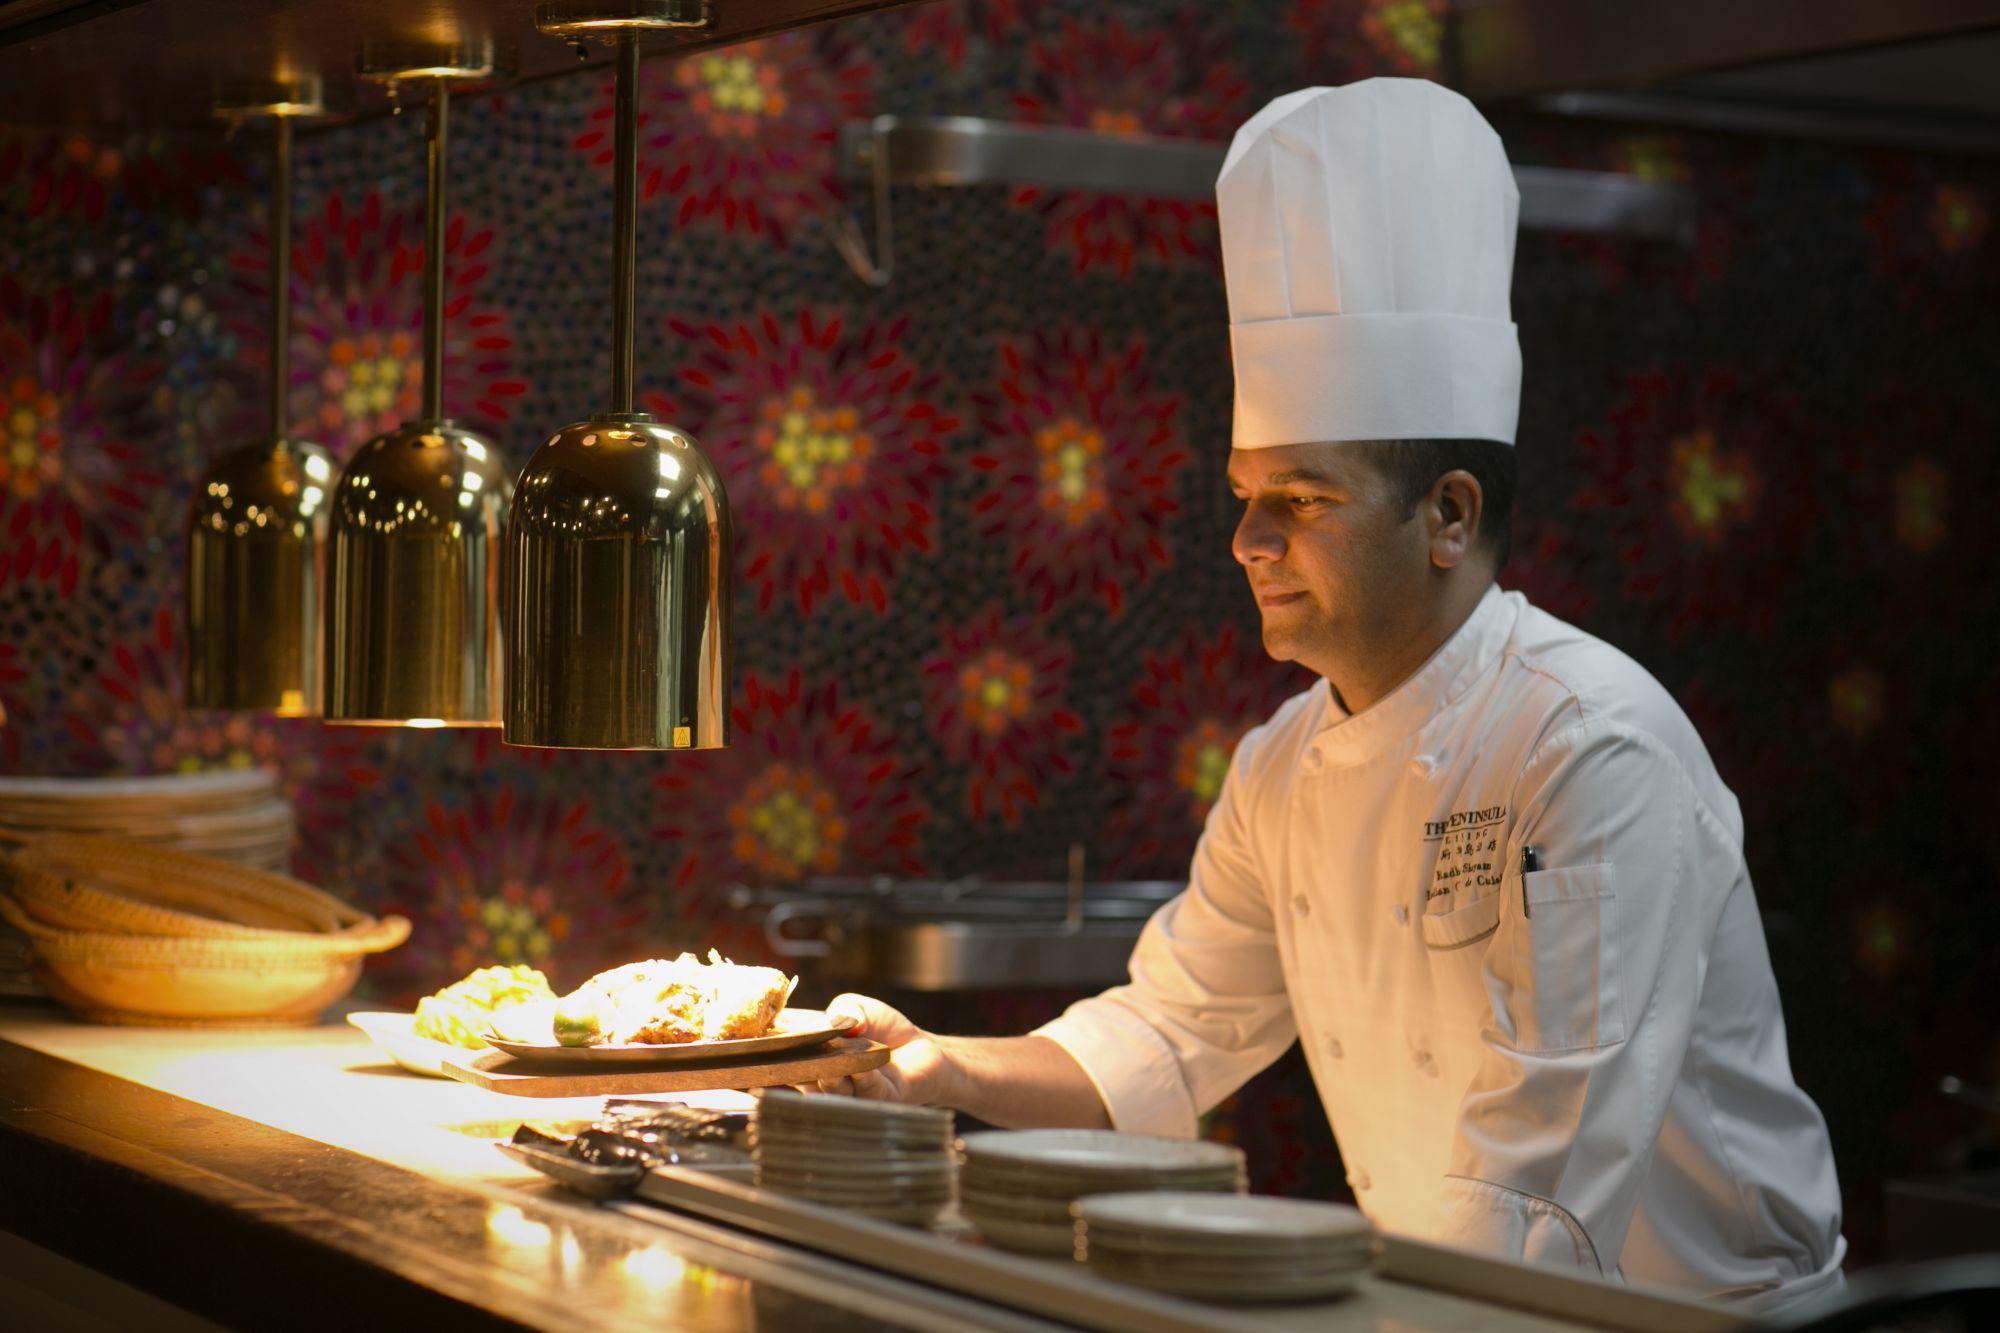 Chef's Table with Radhey Shayam